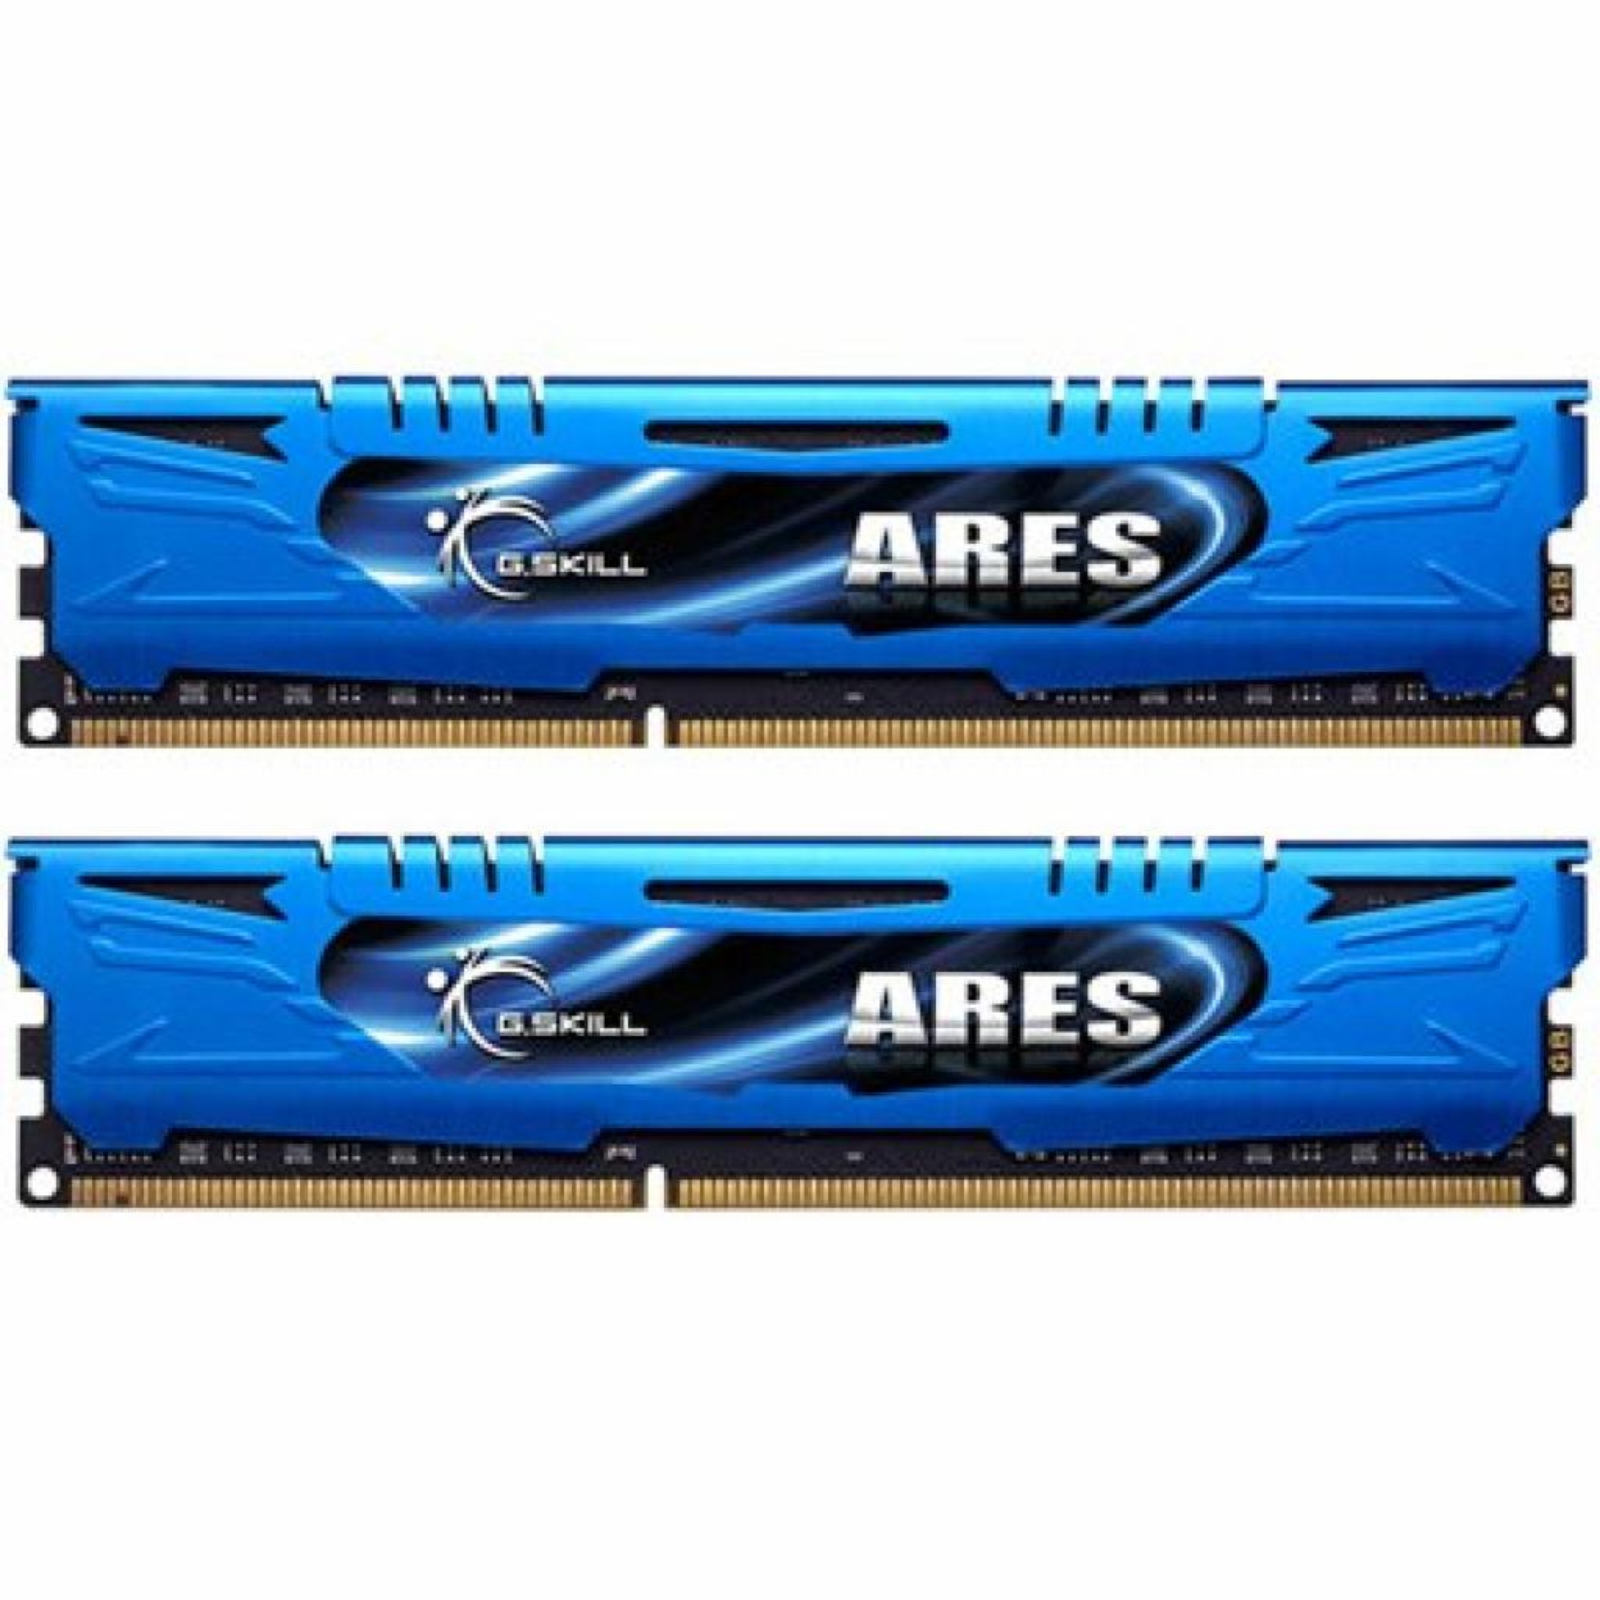 Модуль памяти для компьютера DDR3 8GB (2x4GB) 1600 MHz G.Skill (F3-1600C8D-8GAB)